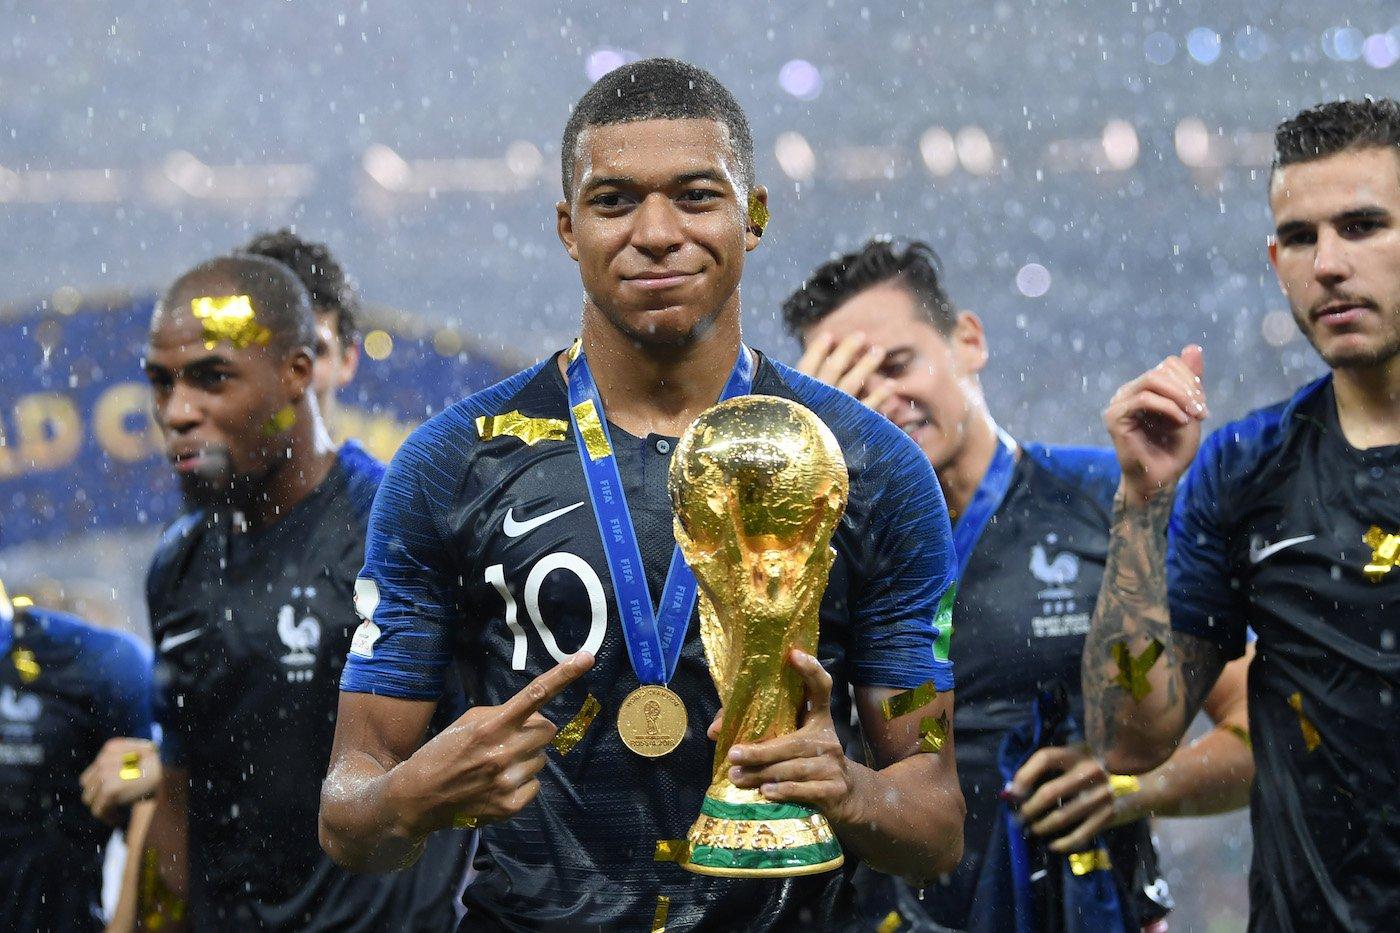 Mbappe, France, FIFA world cup 2018, Croatia, Ronaldo, Paris Saint-Germain, Footballing sensation, Pele, Brazil, Argentina, Emmanuel Macaron, French president, India,